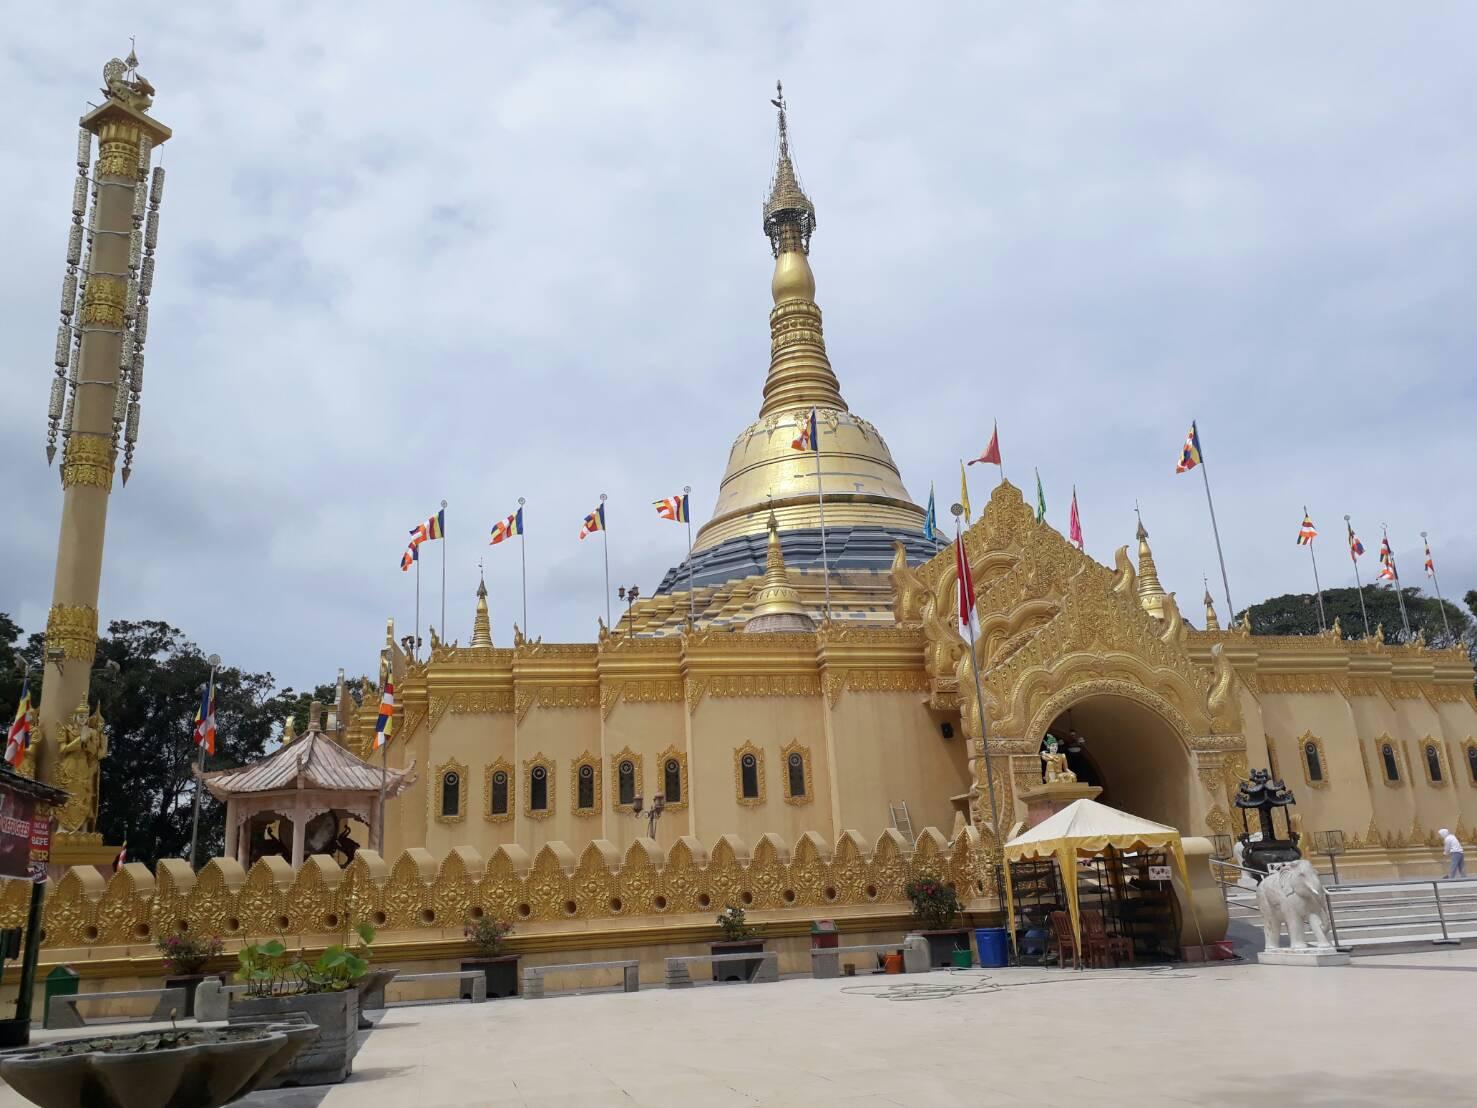 Taman Alam Lumbini Pagoda Megah Dataran Tinggi Karo Oleh Risman